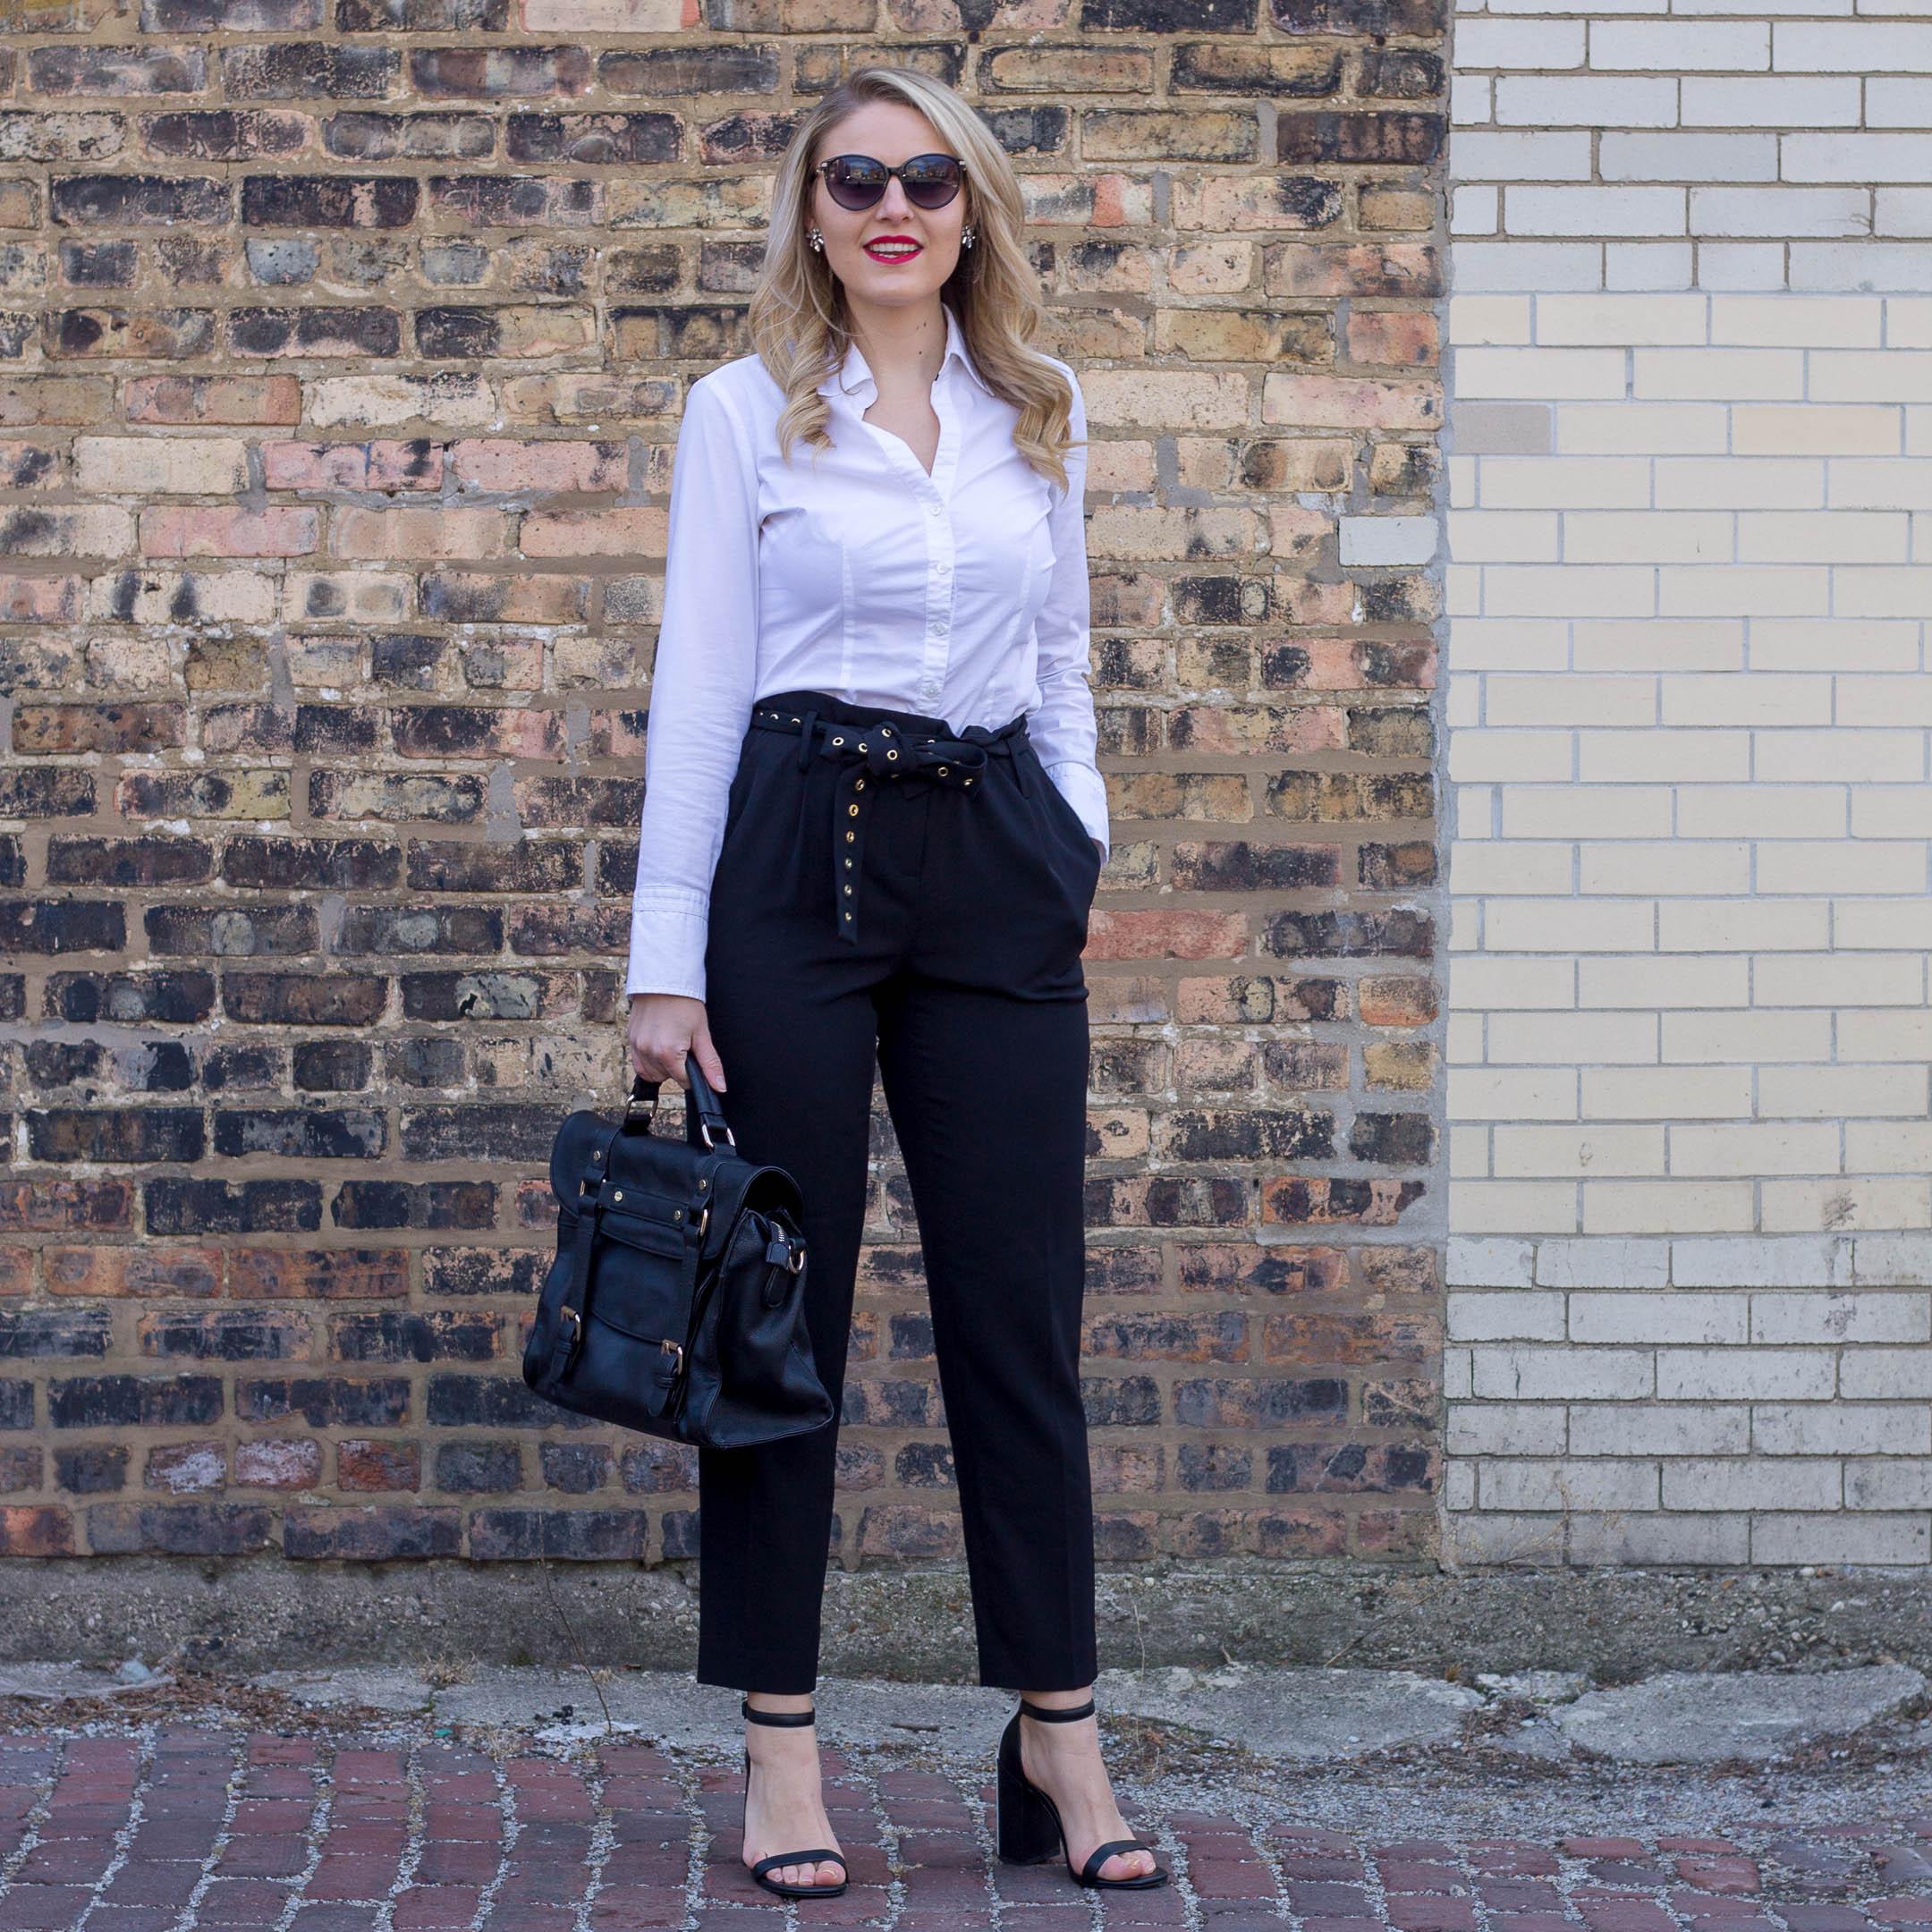 Cropped Pants // Studded Belt